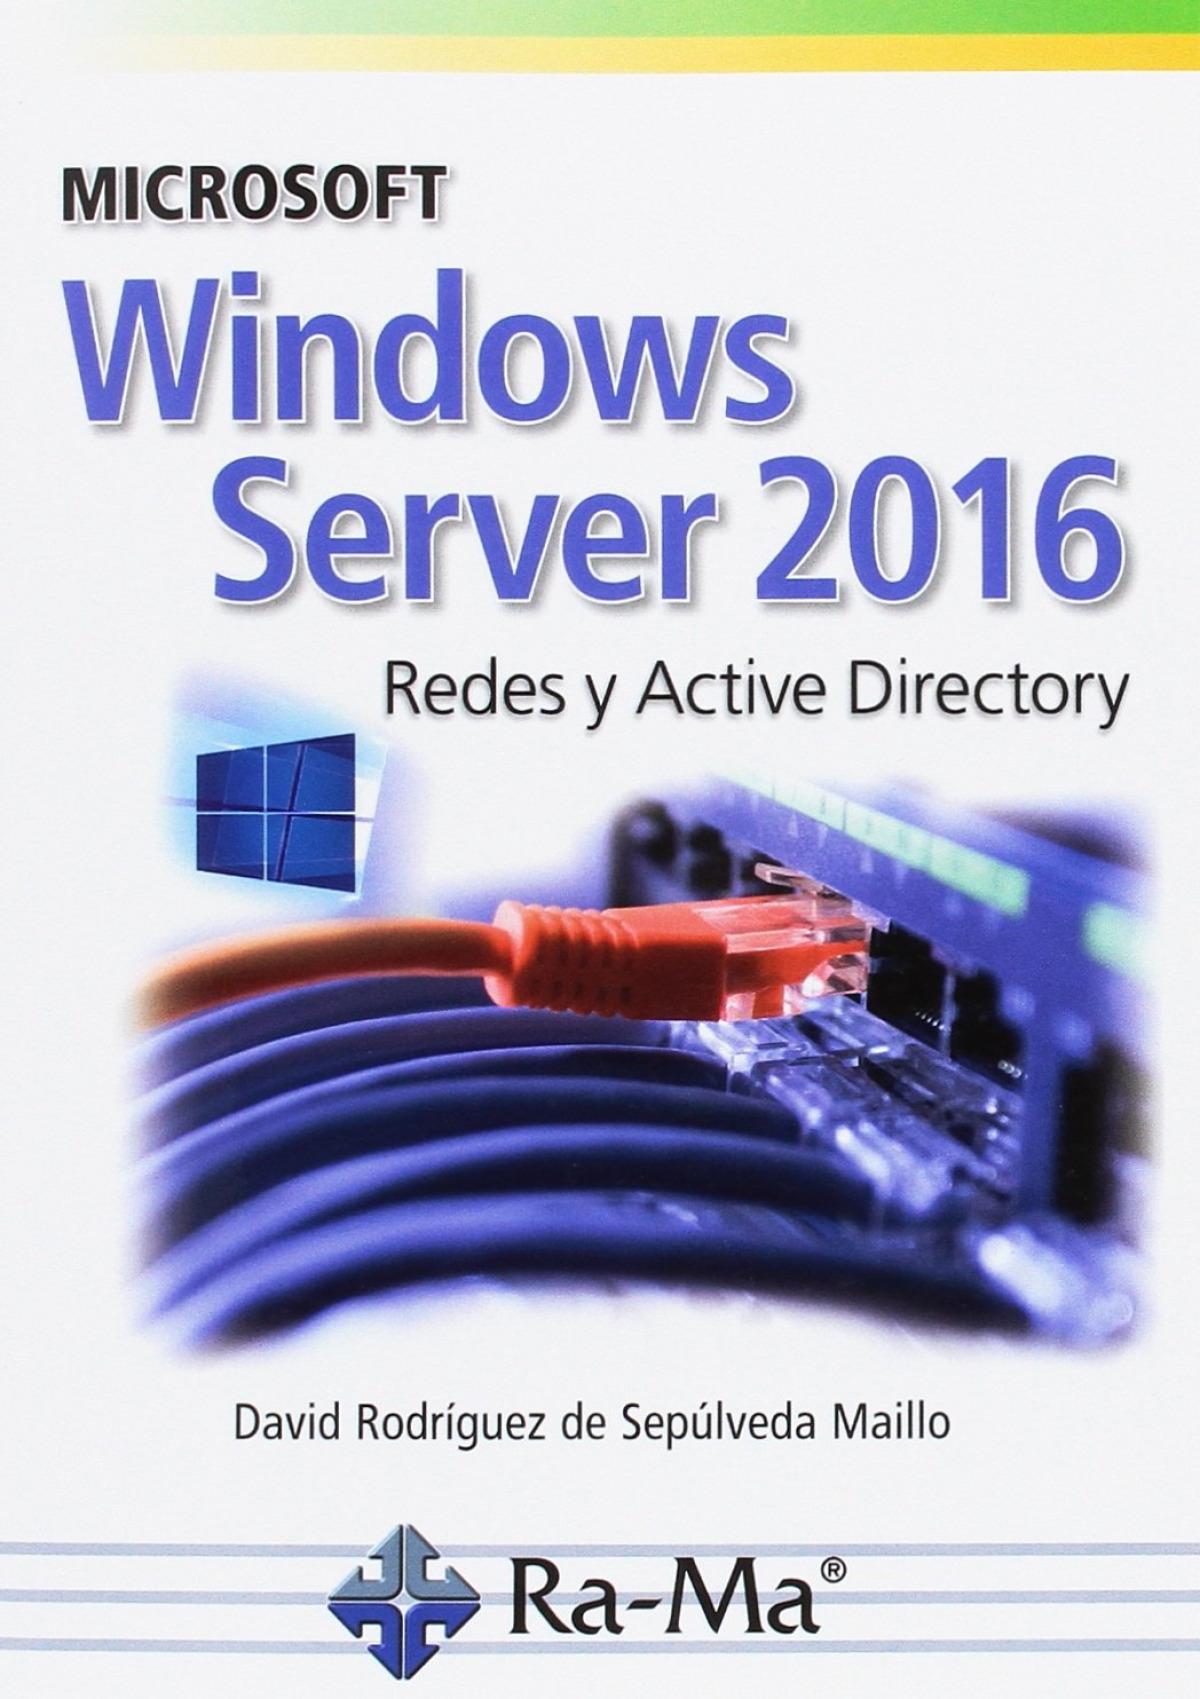 MICROSOFT WINDOWS SERVER 2016 9788499647029